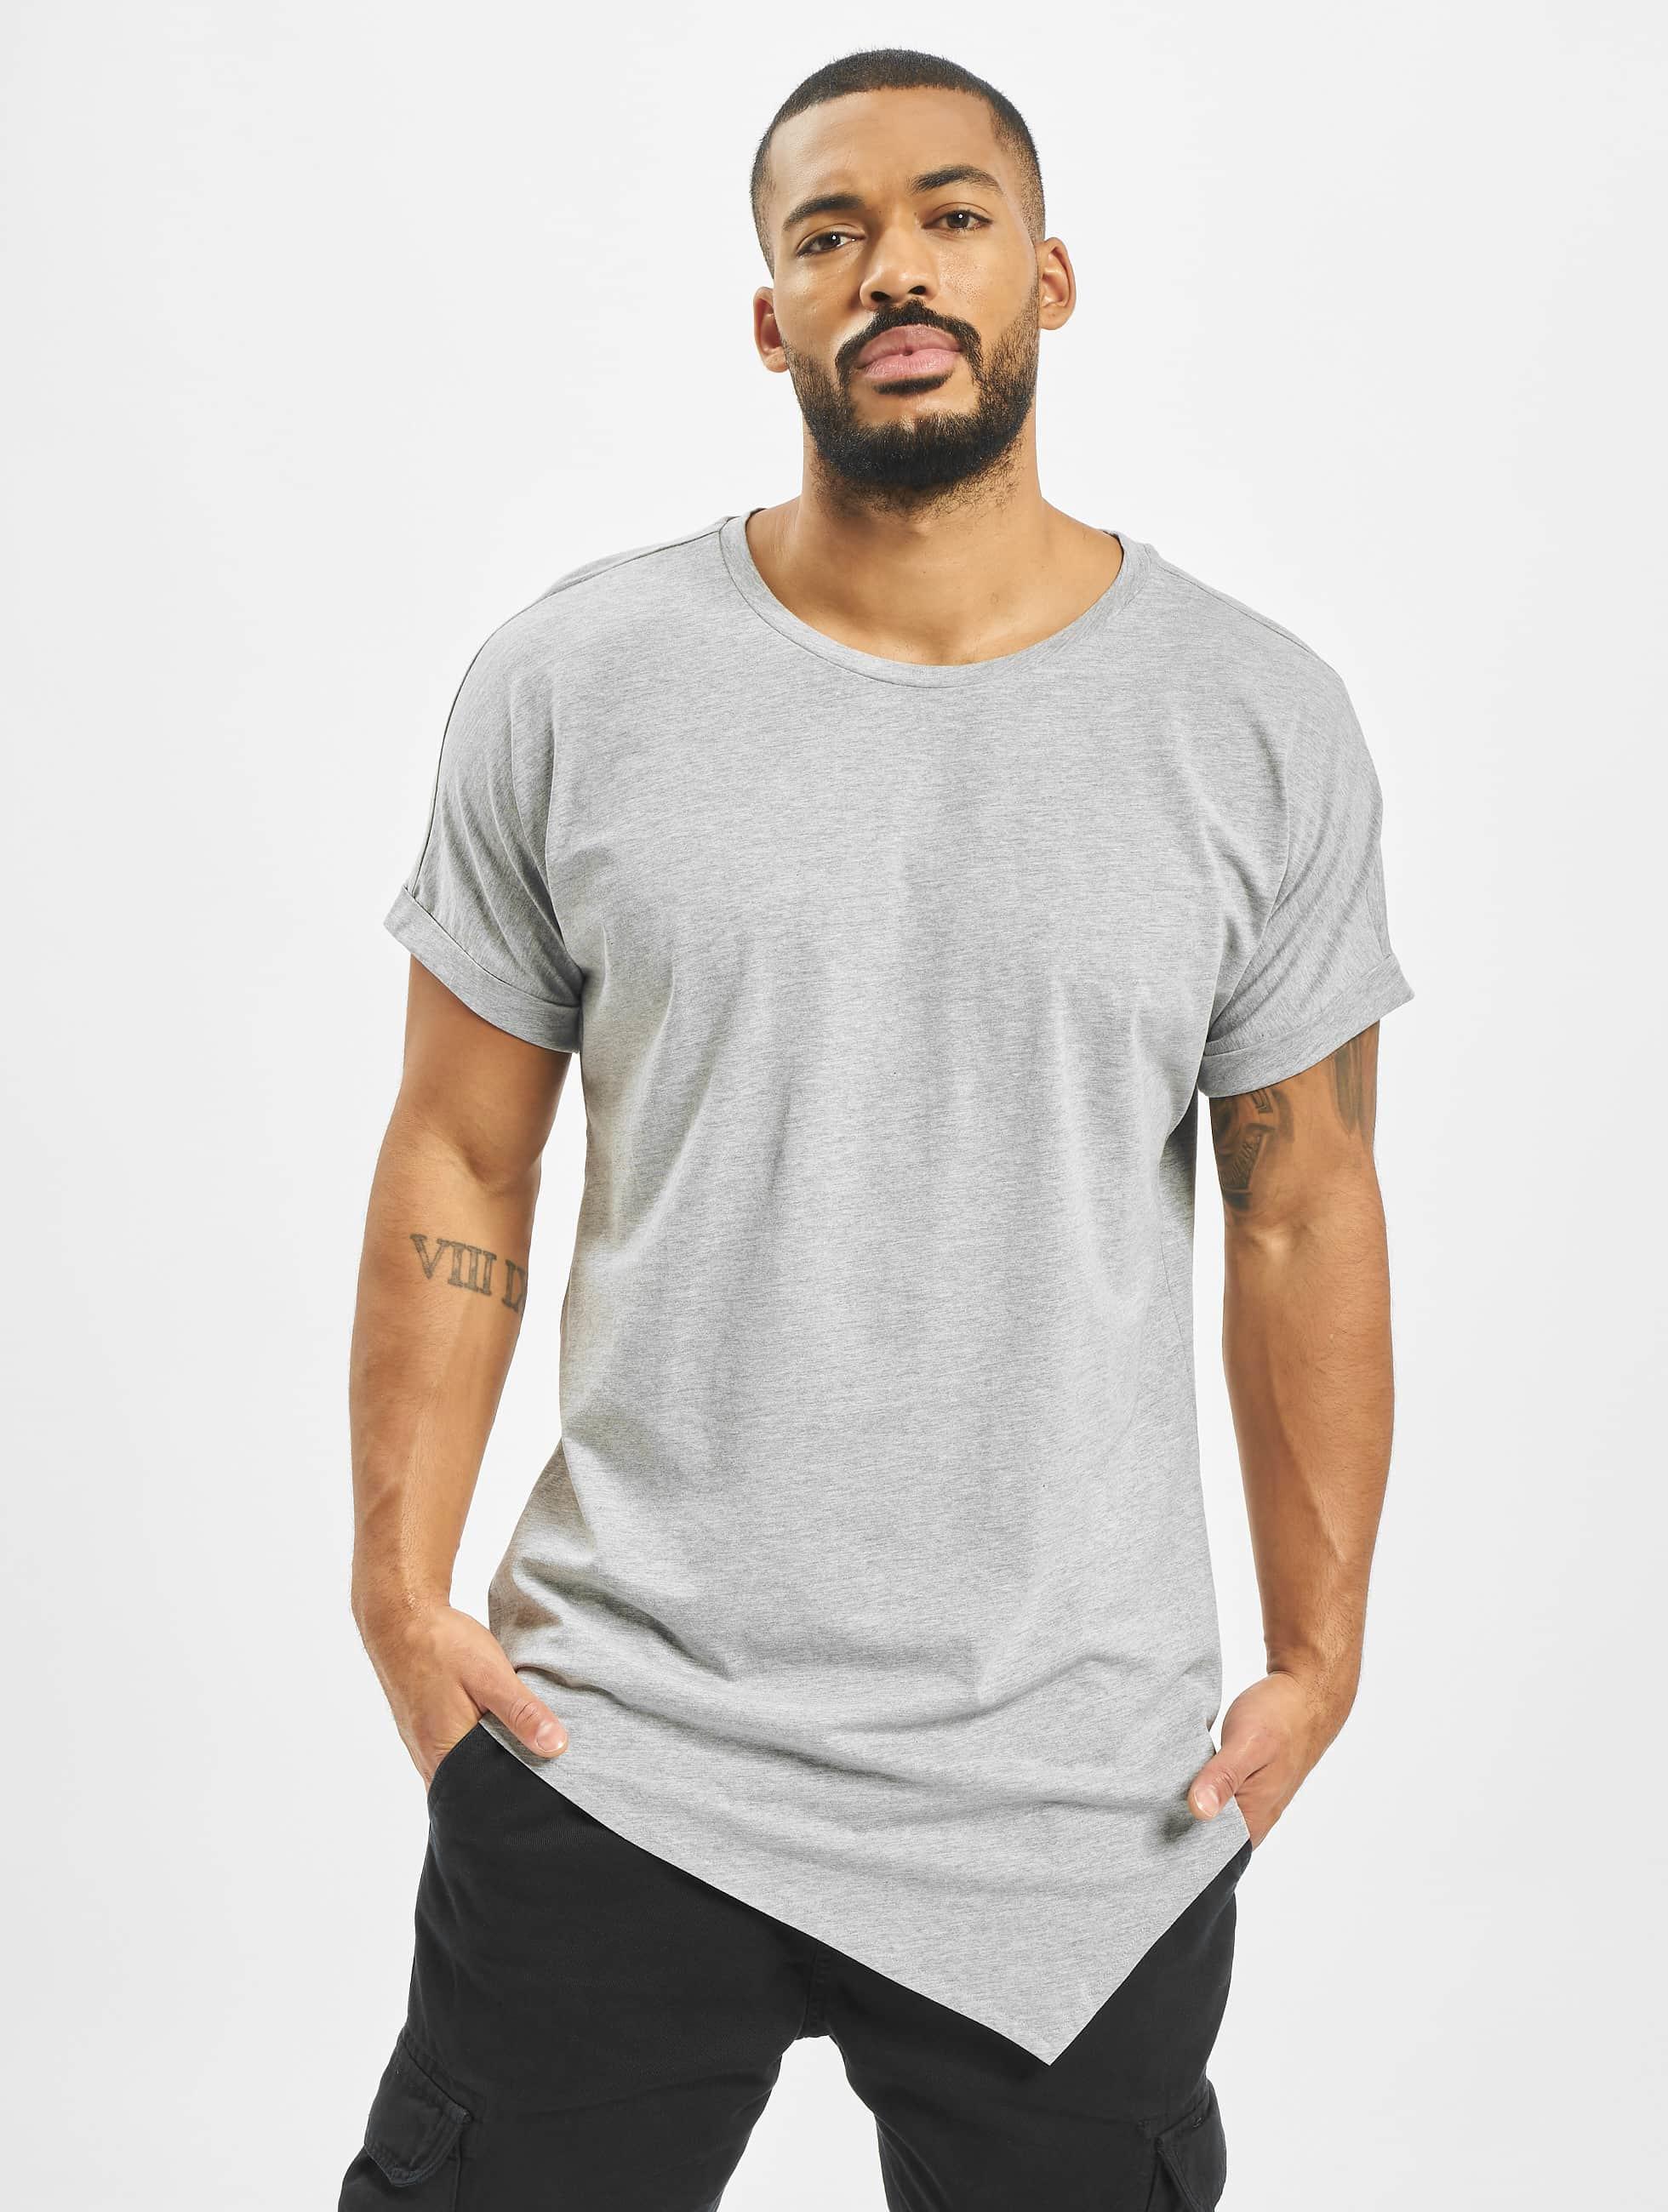 Urban Classics Haut / T-Shirt Asymetric Long en gris